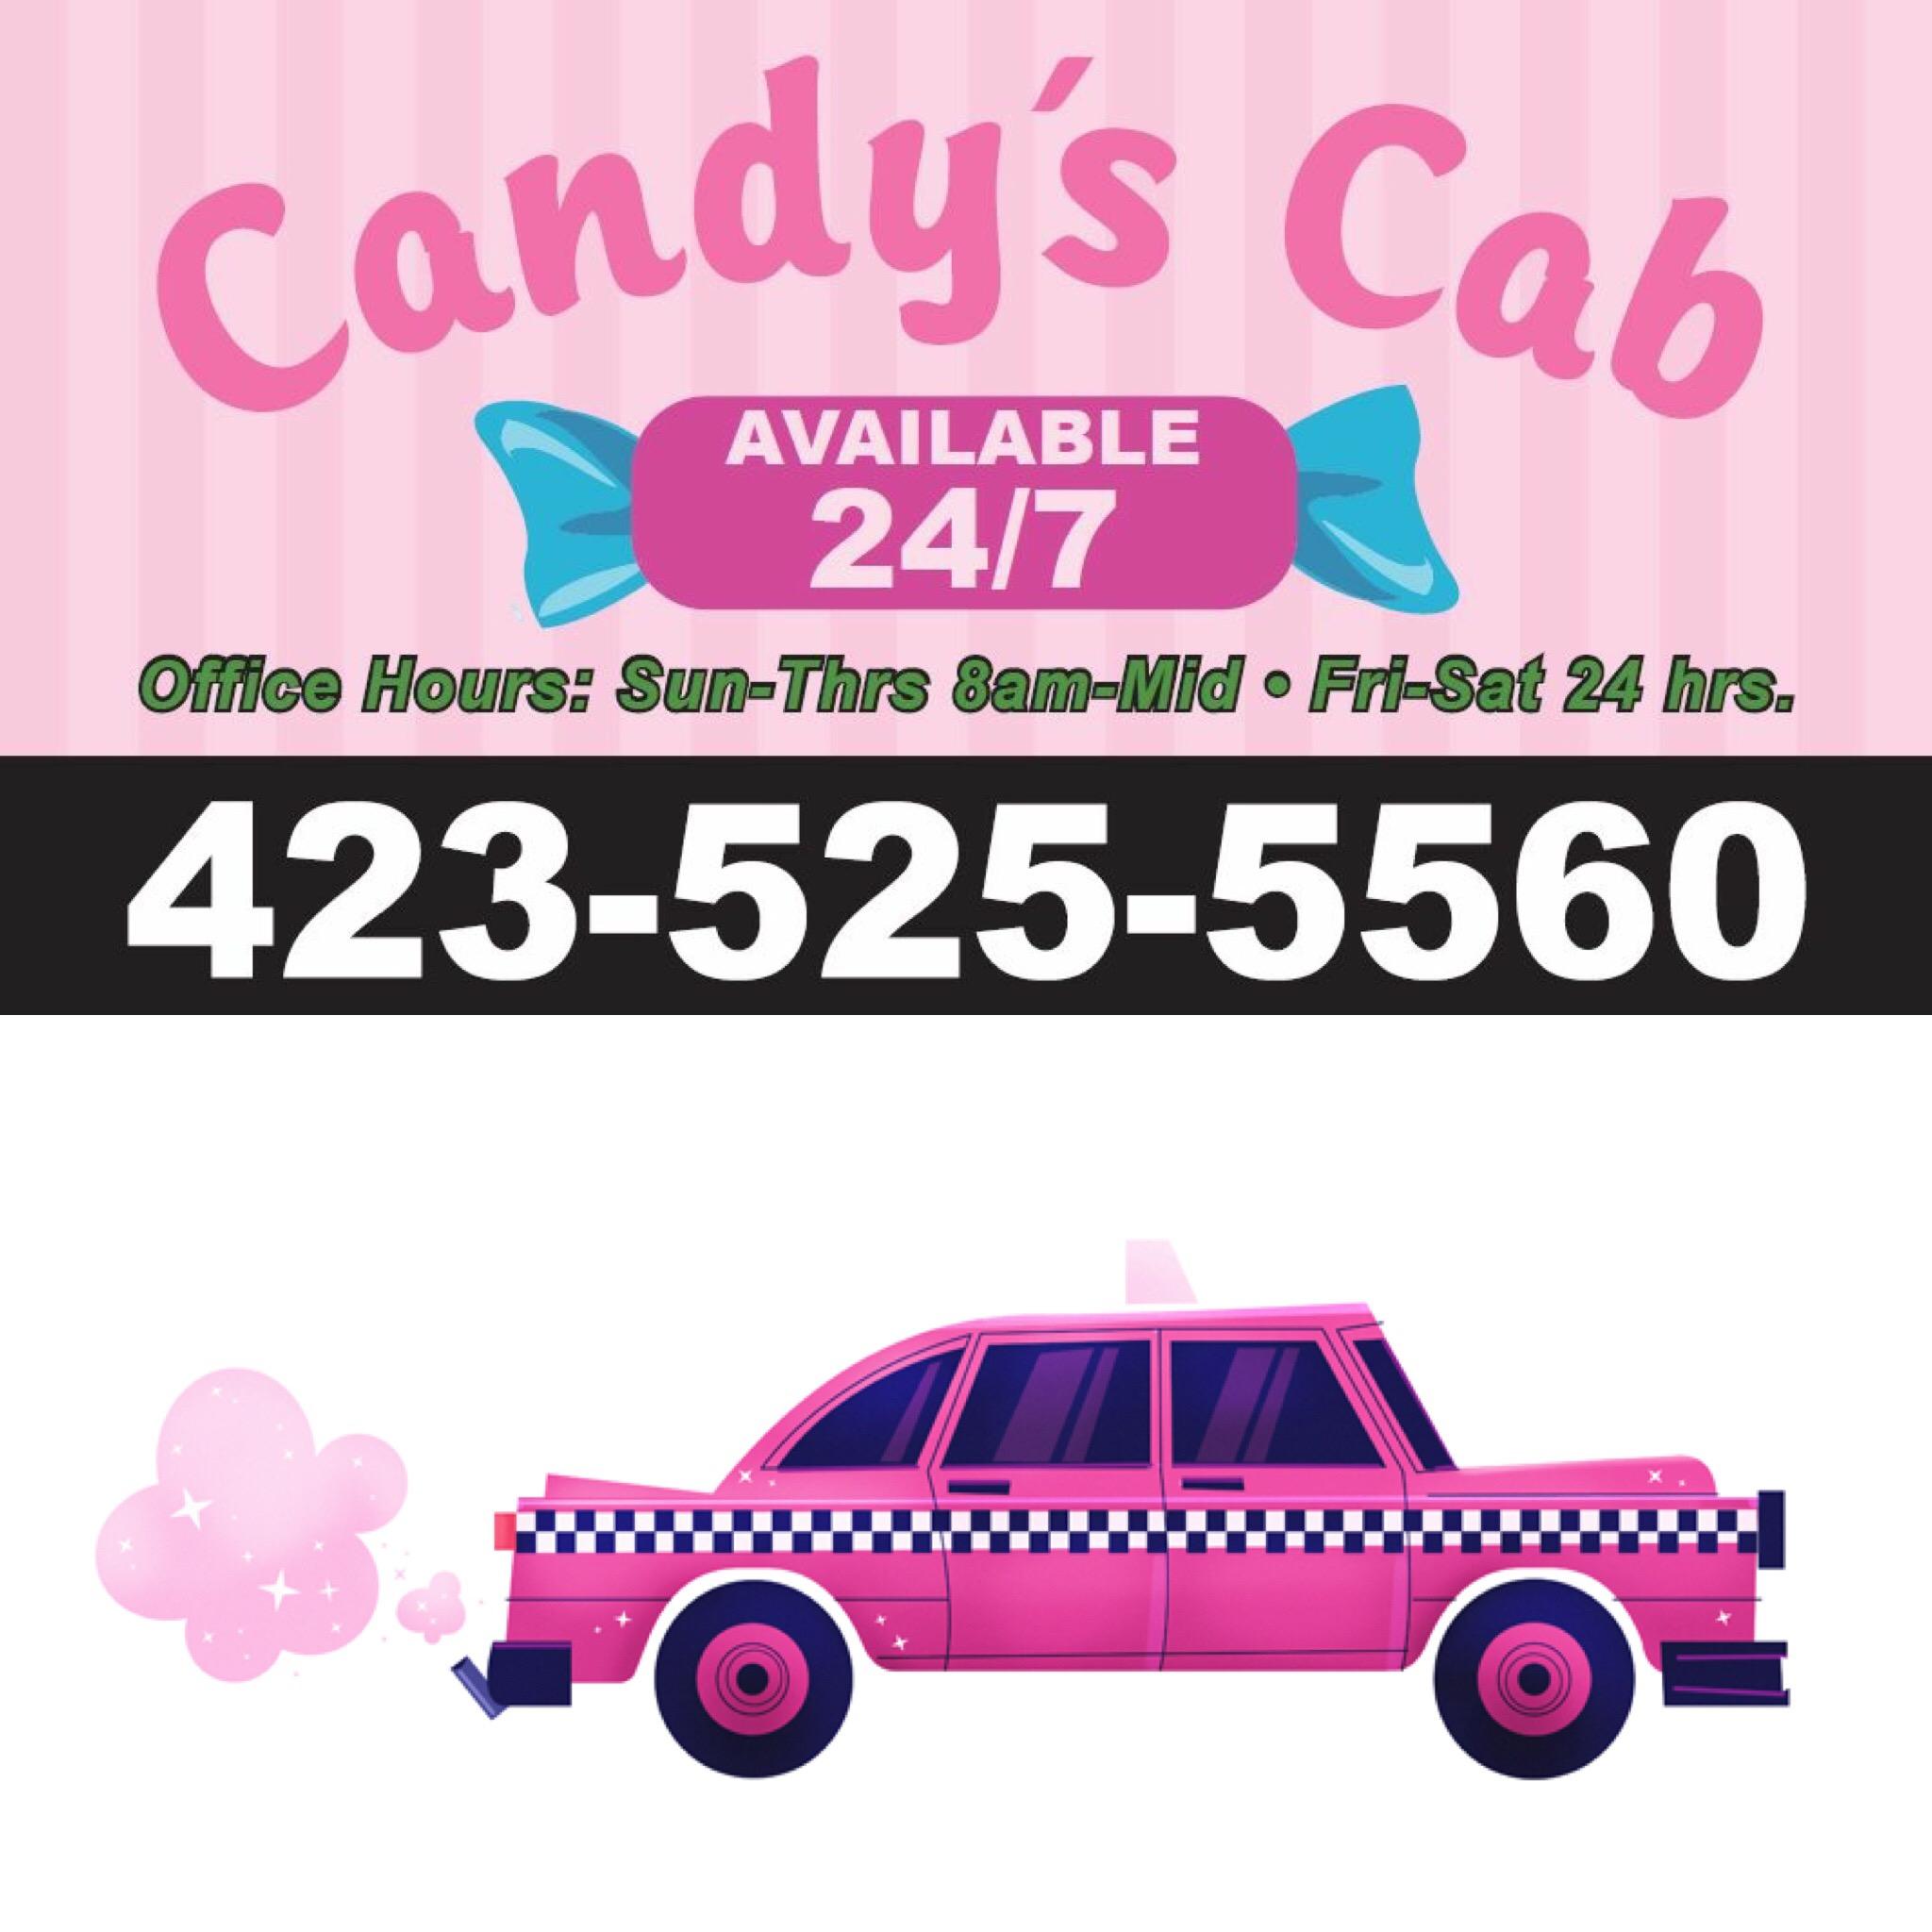 Candy's Cab, Greeneville TN